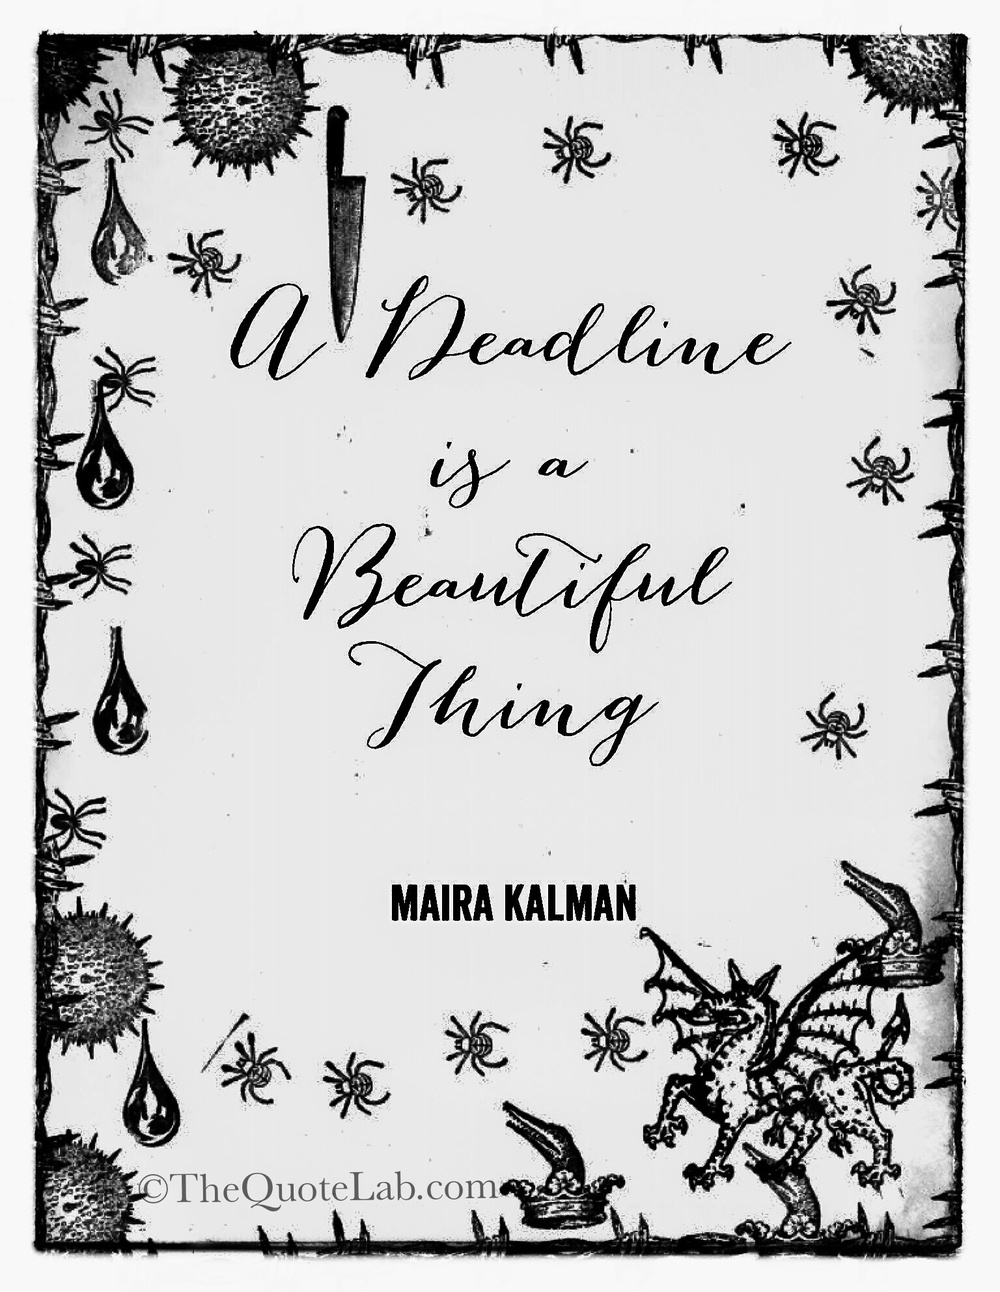 """A deadline is a beautiful thing."" -Maira Kalman"